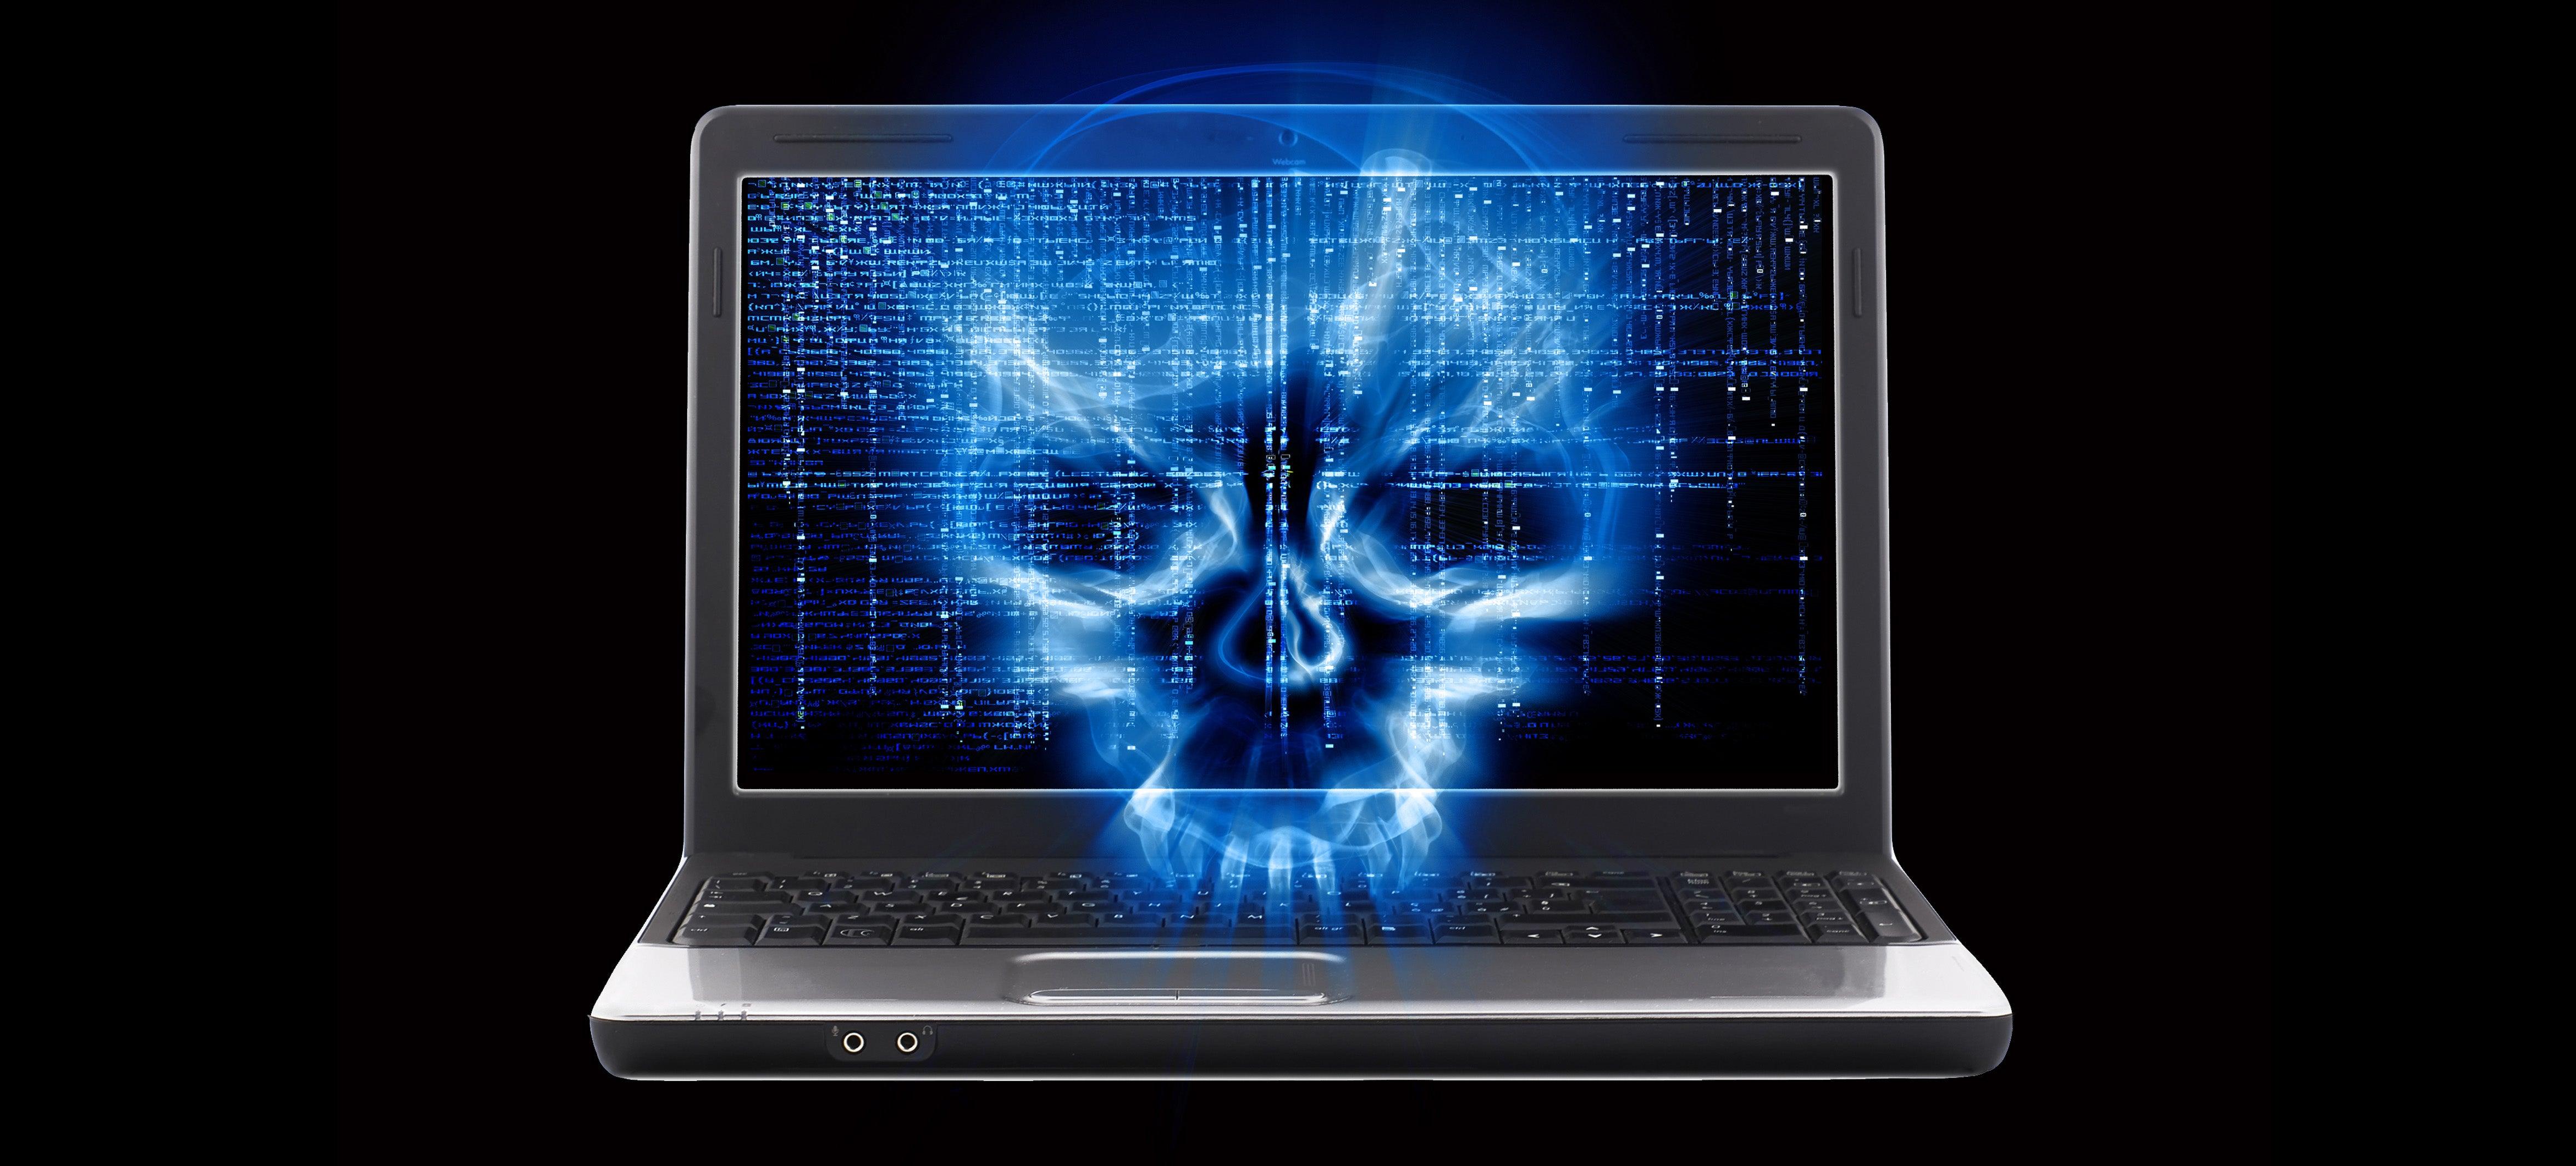 The Internet's Biggest Enemies